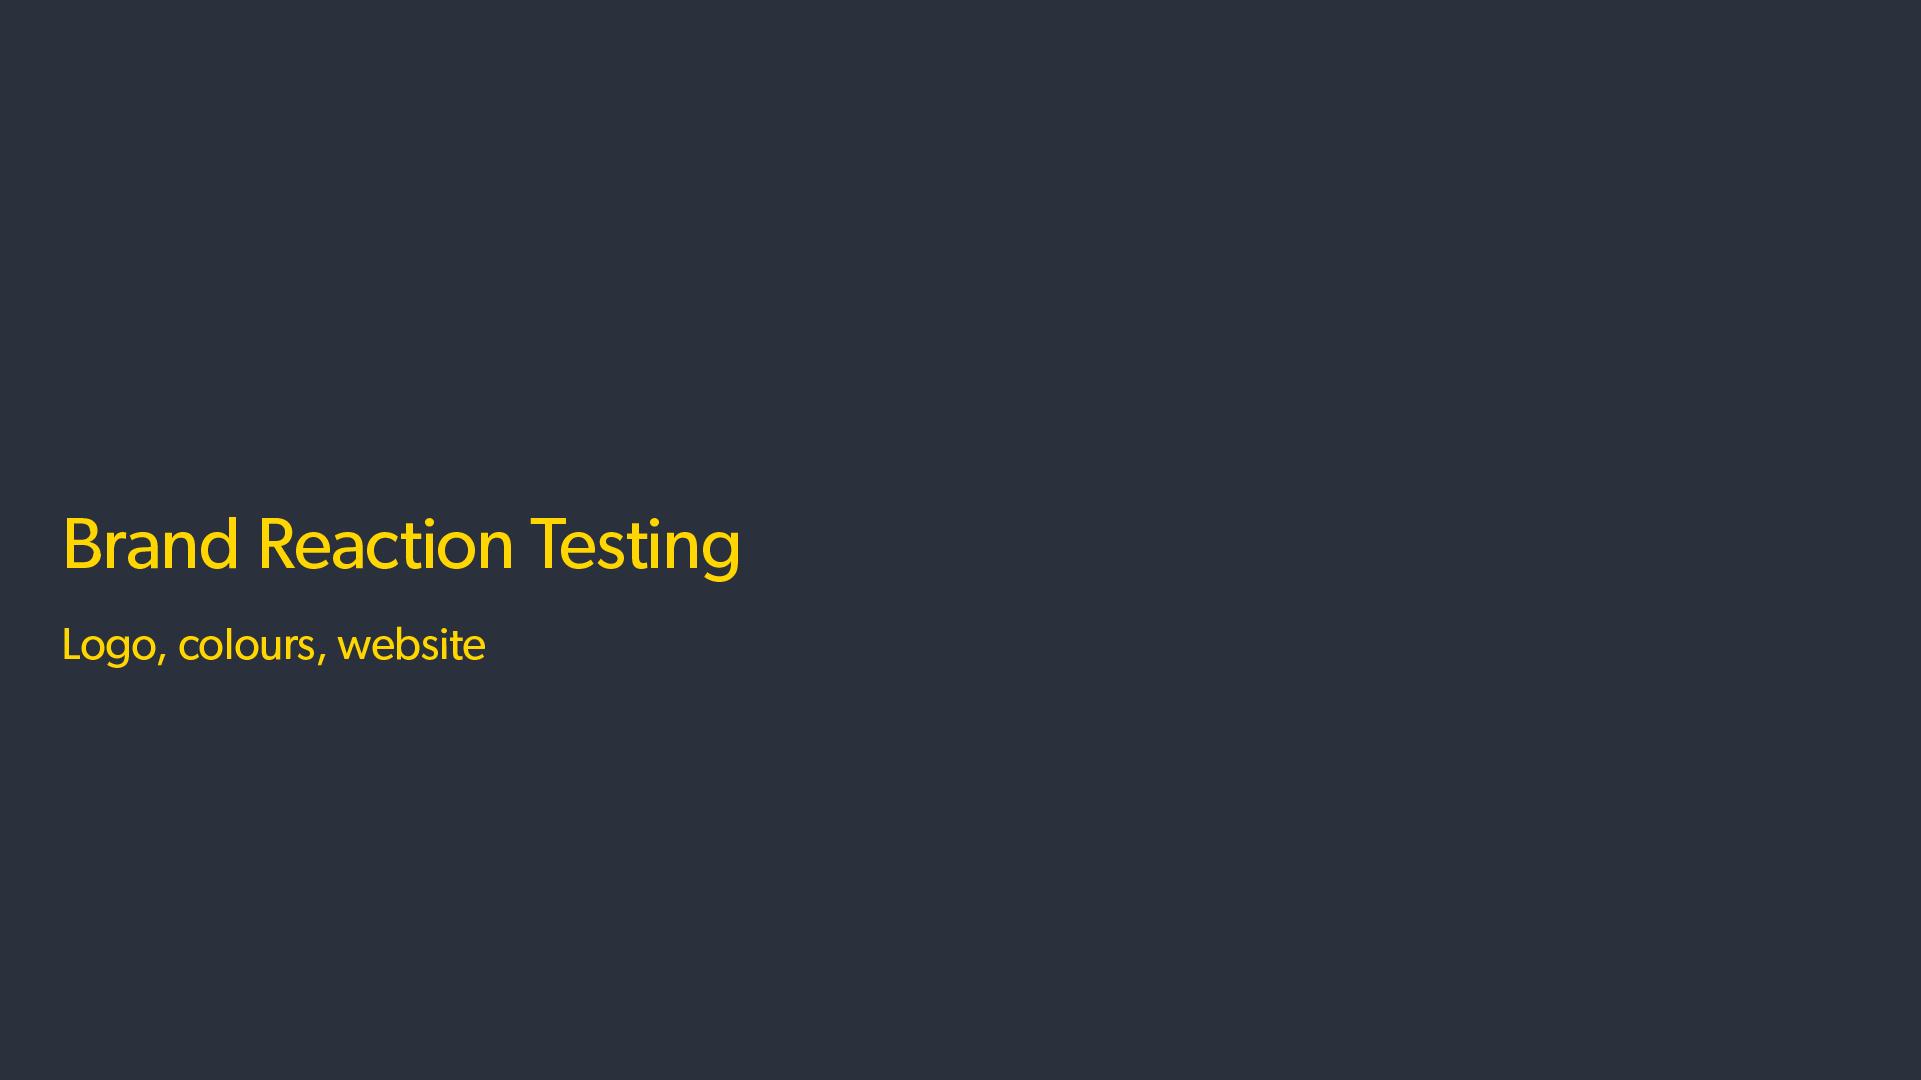 cf-rebrand-brand-testing-screen-1.png